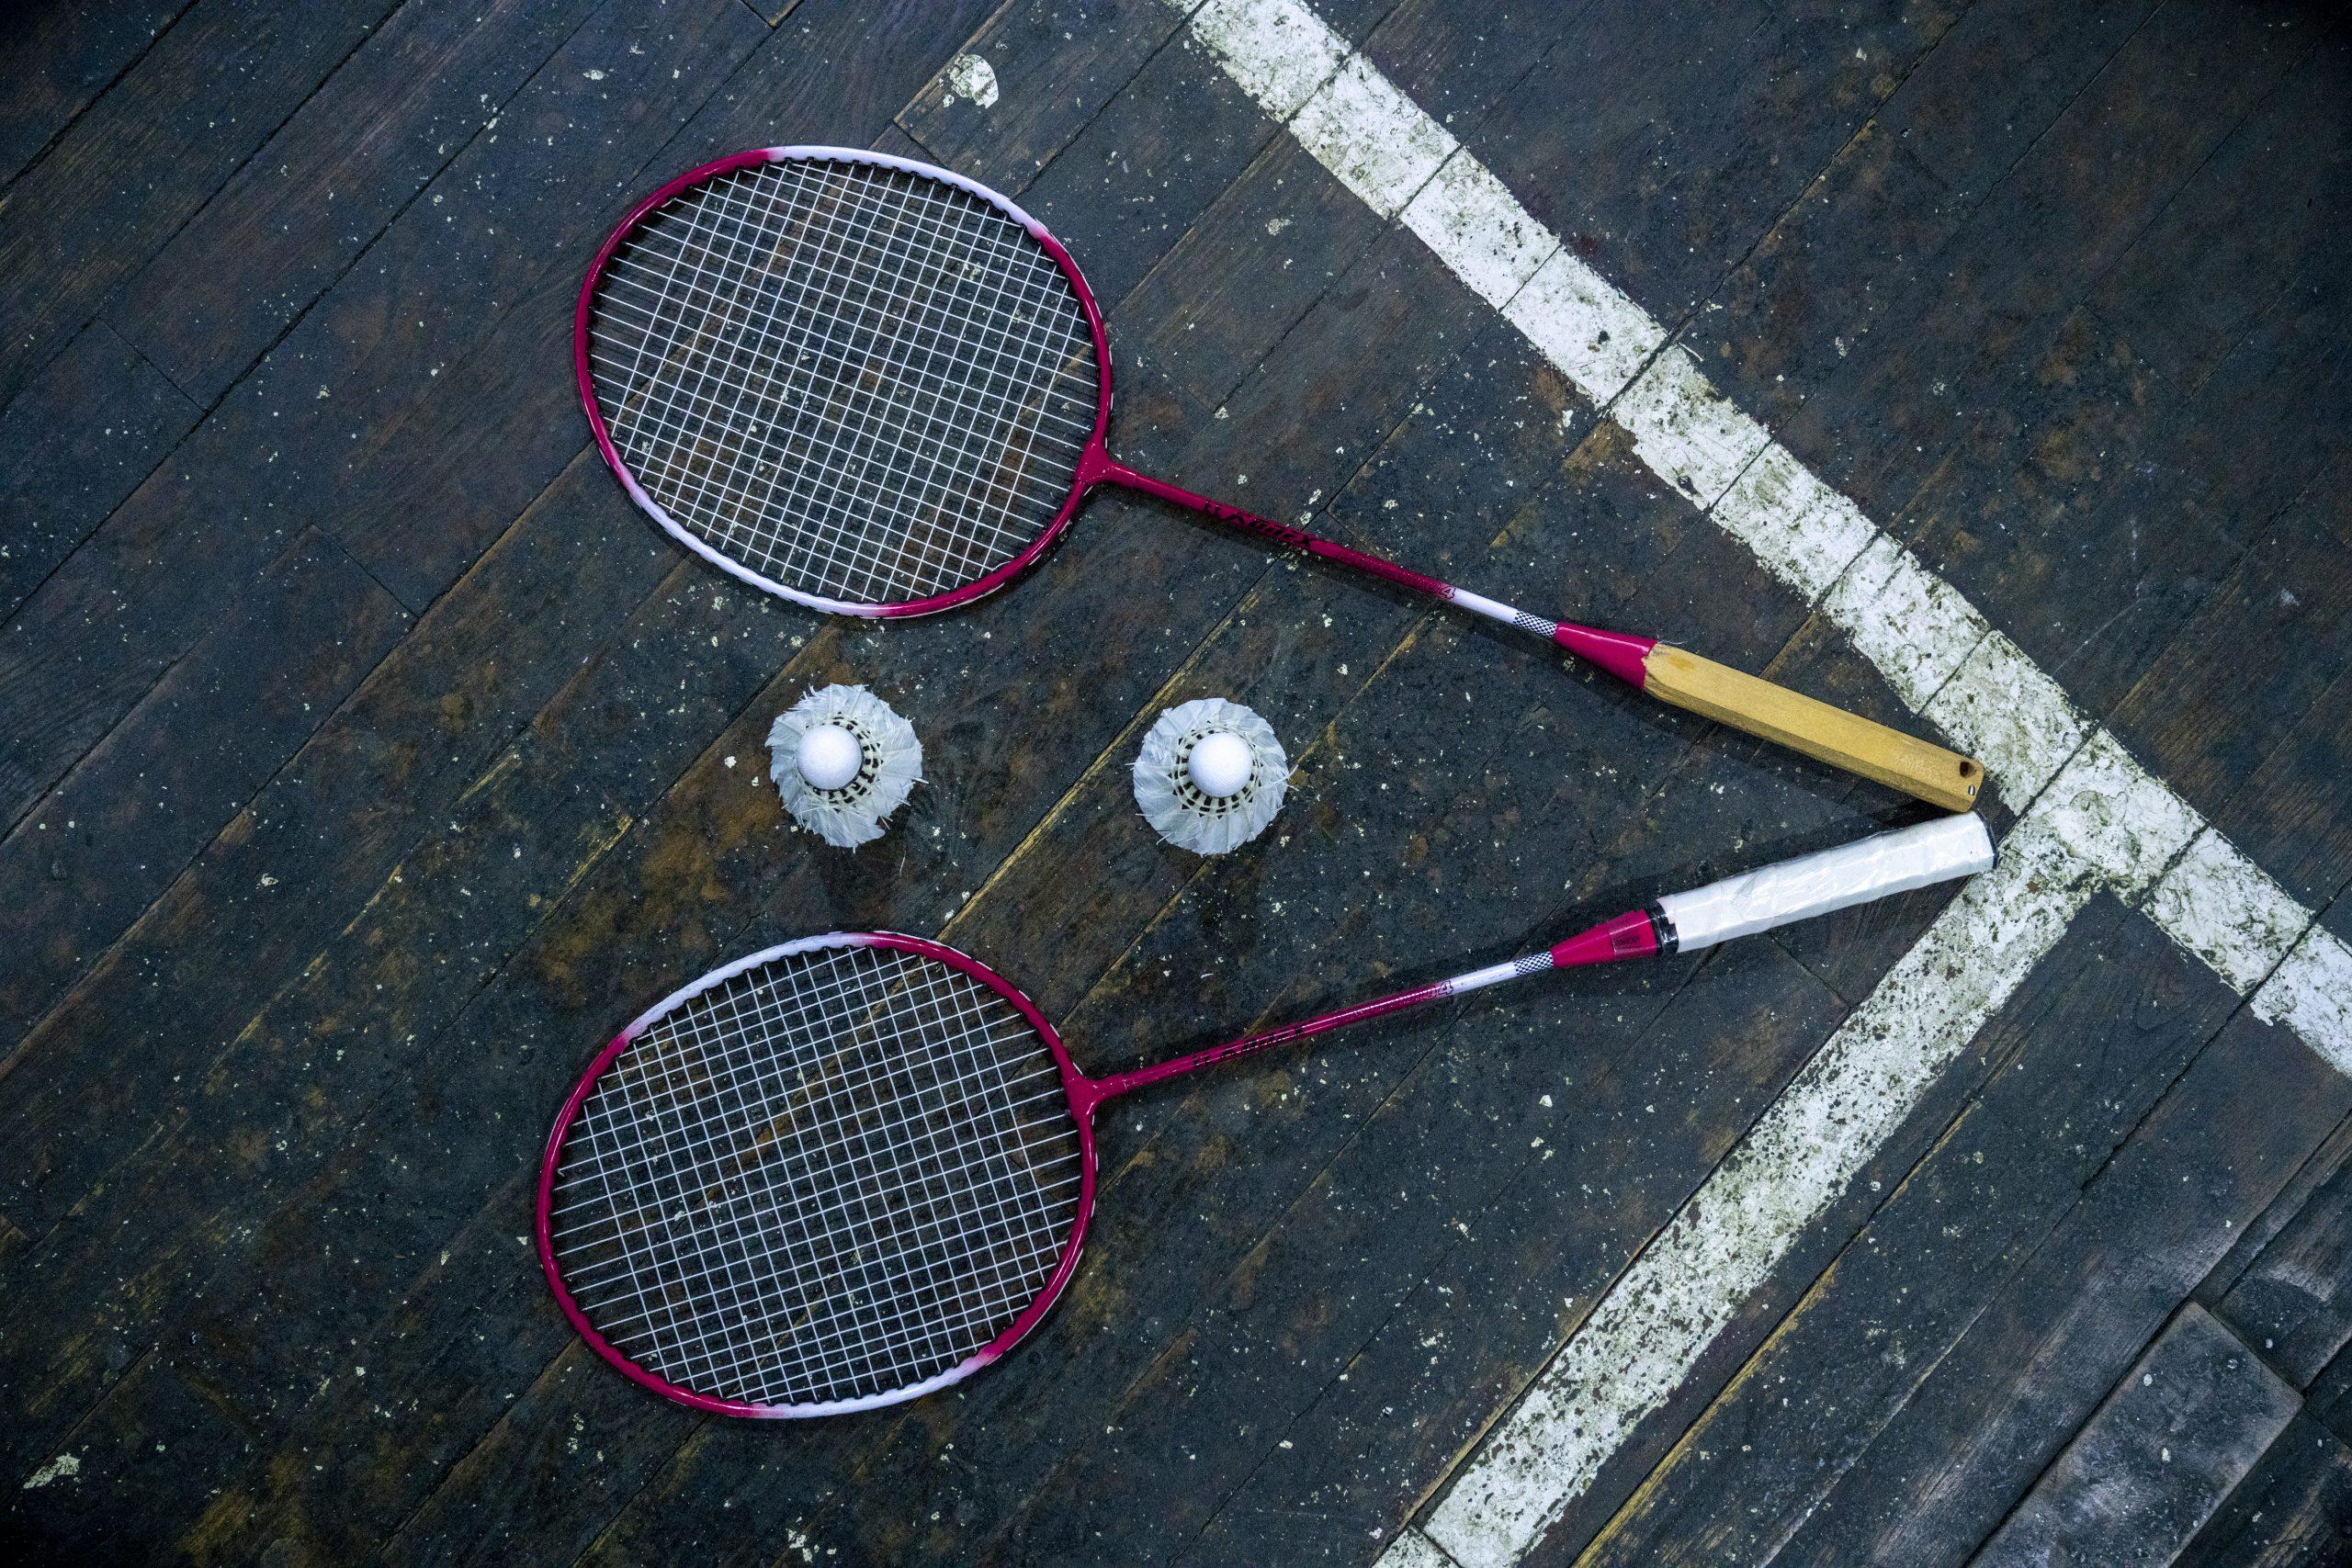 Badminton sports Equipment